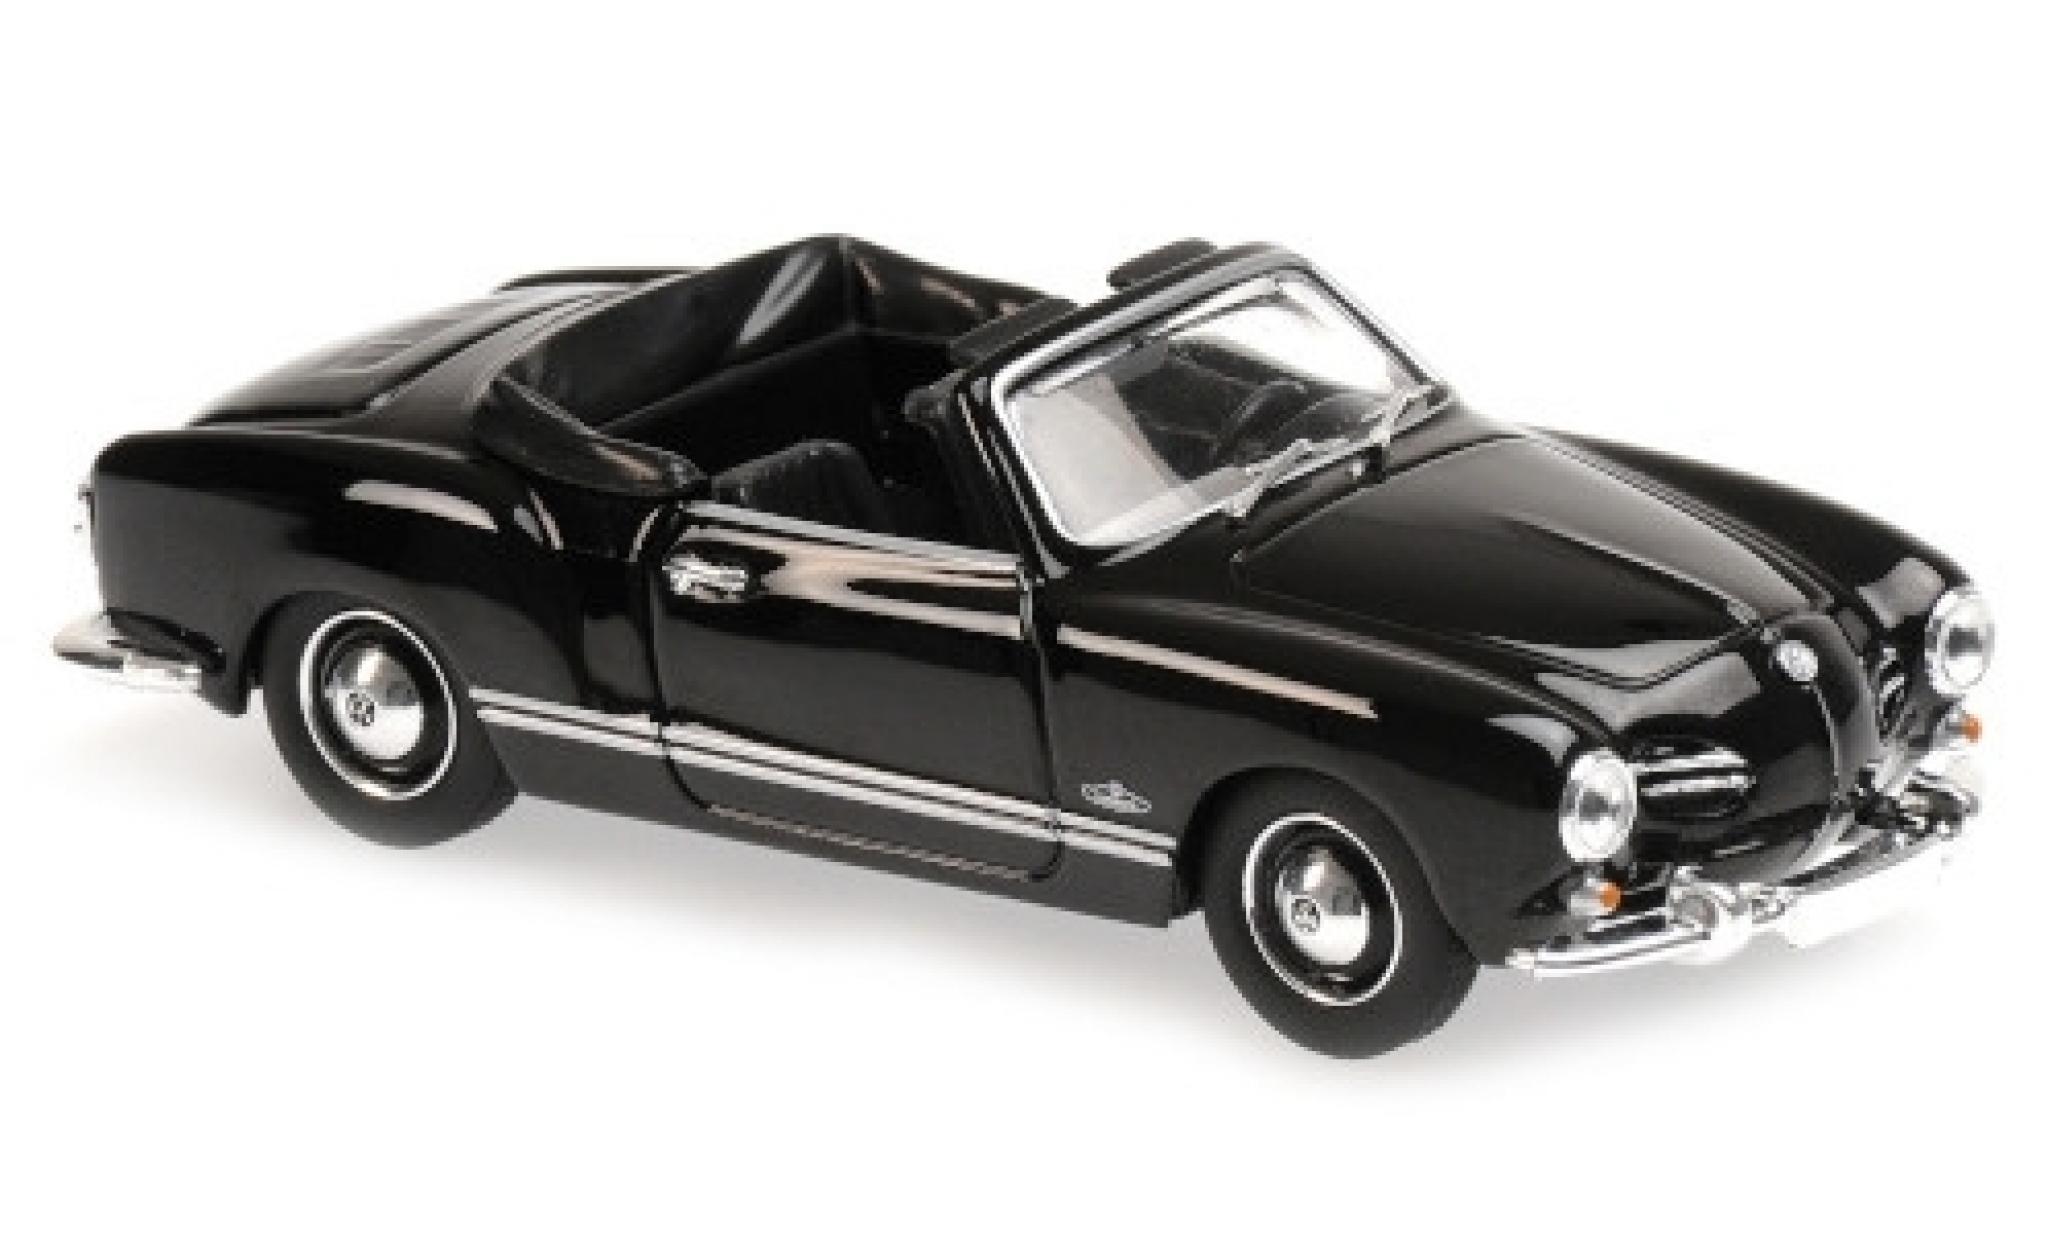 Volkswagen Karmann 1/43 Maxichamps Ghia Cabriolet (Typ 14) noire 1955